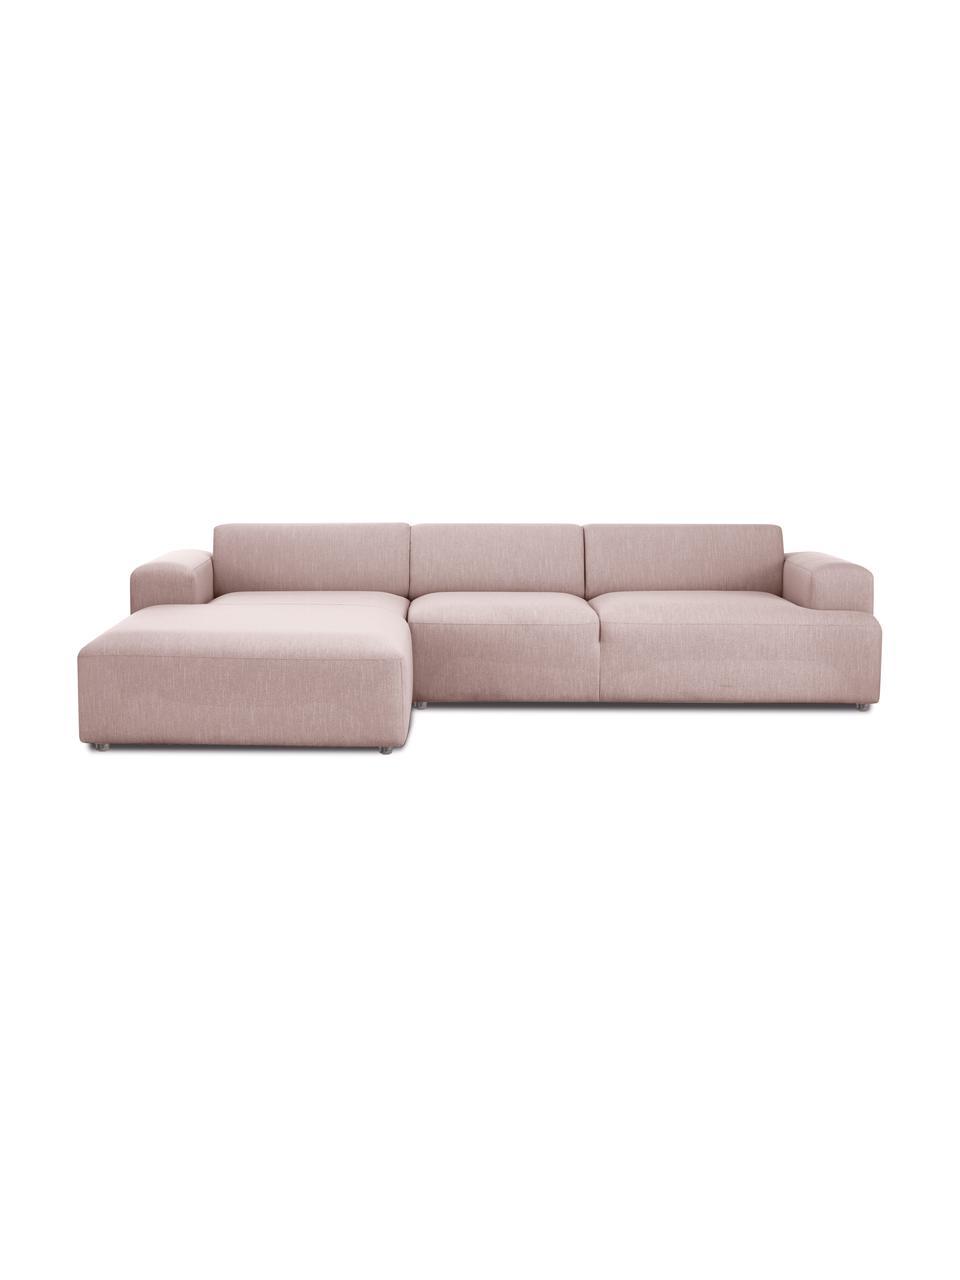 Canapé d'angle 4 places rose Melva, Tissu rose